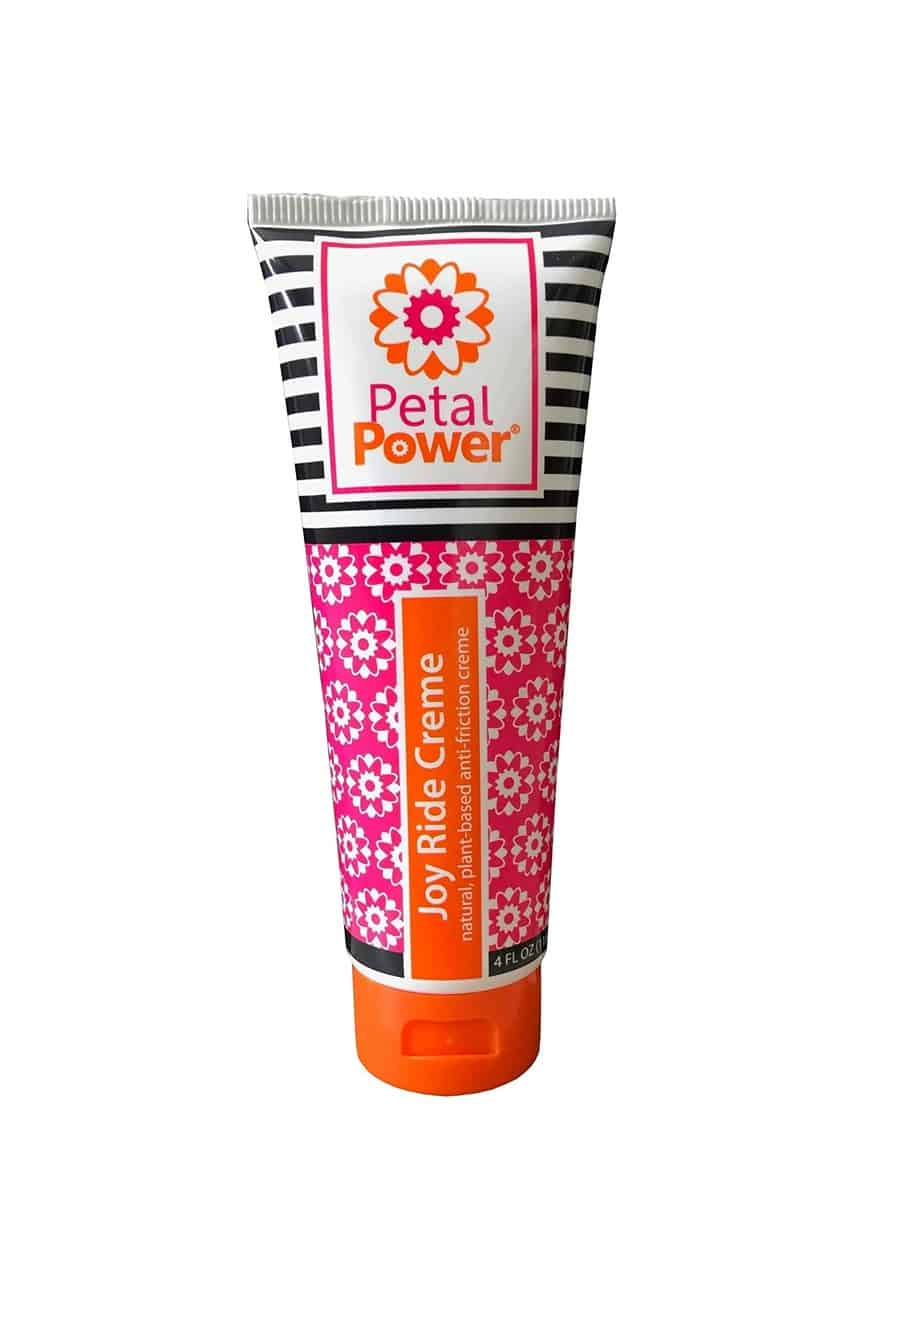 Petal Power Joy Ride Women's Natural Anti-Chafe Chamois Cream | Amazon